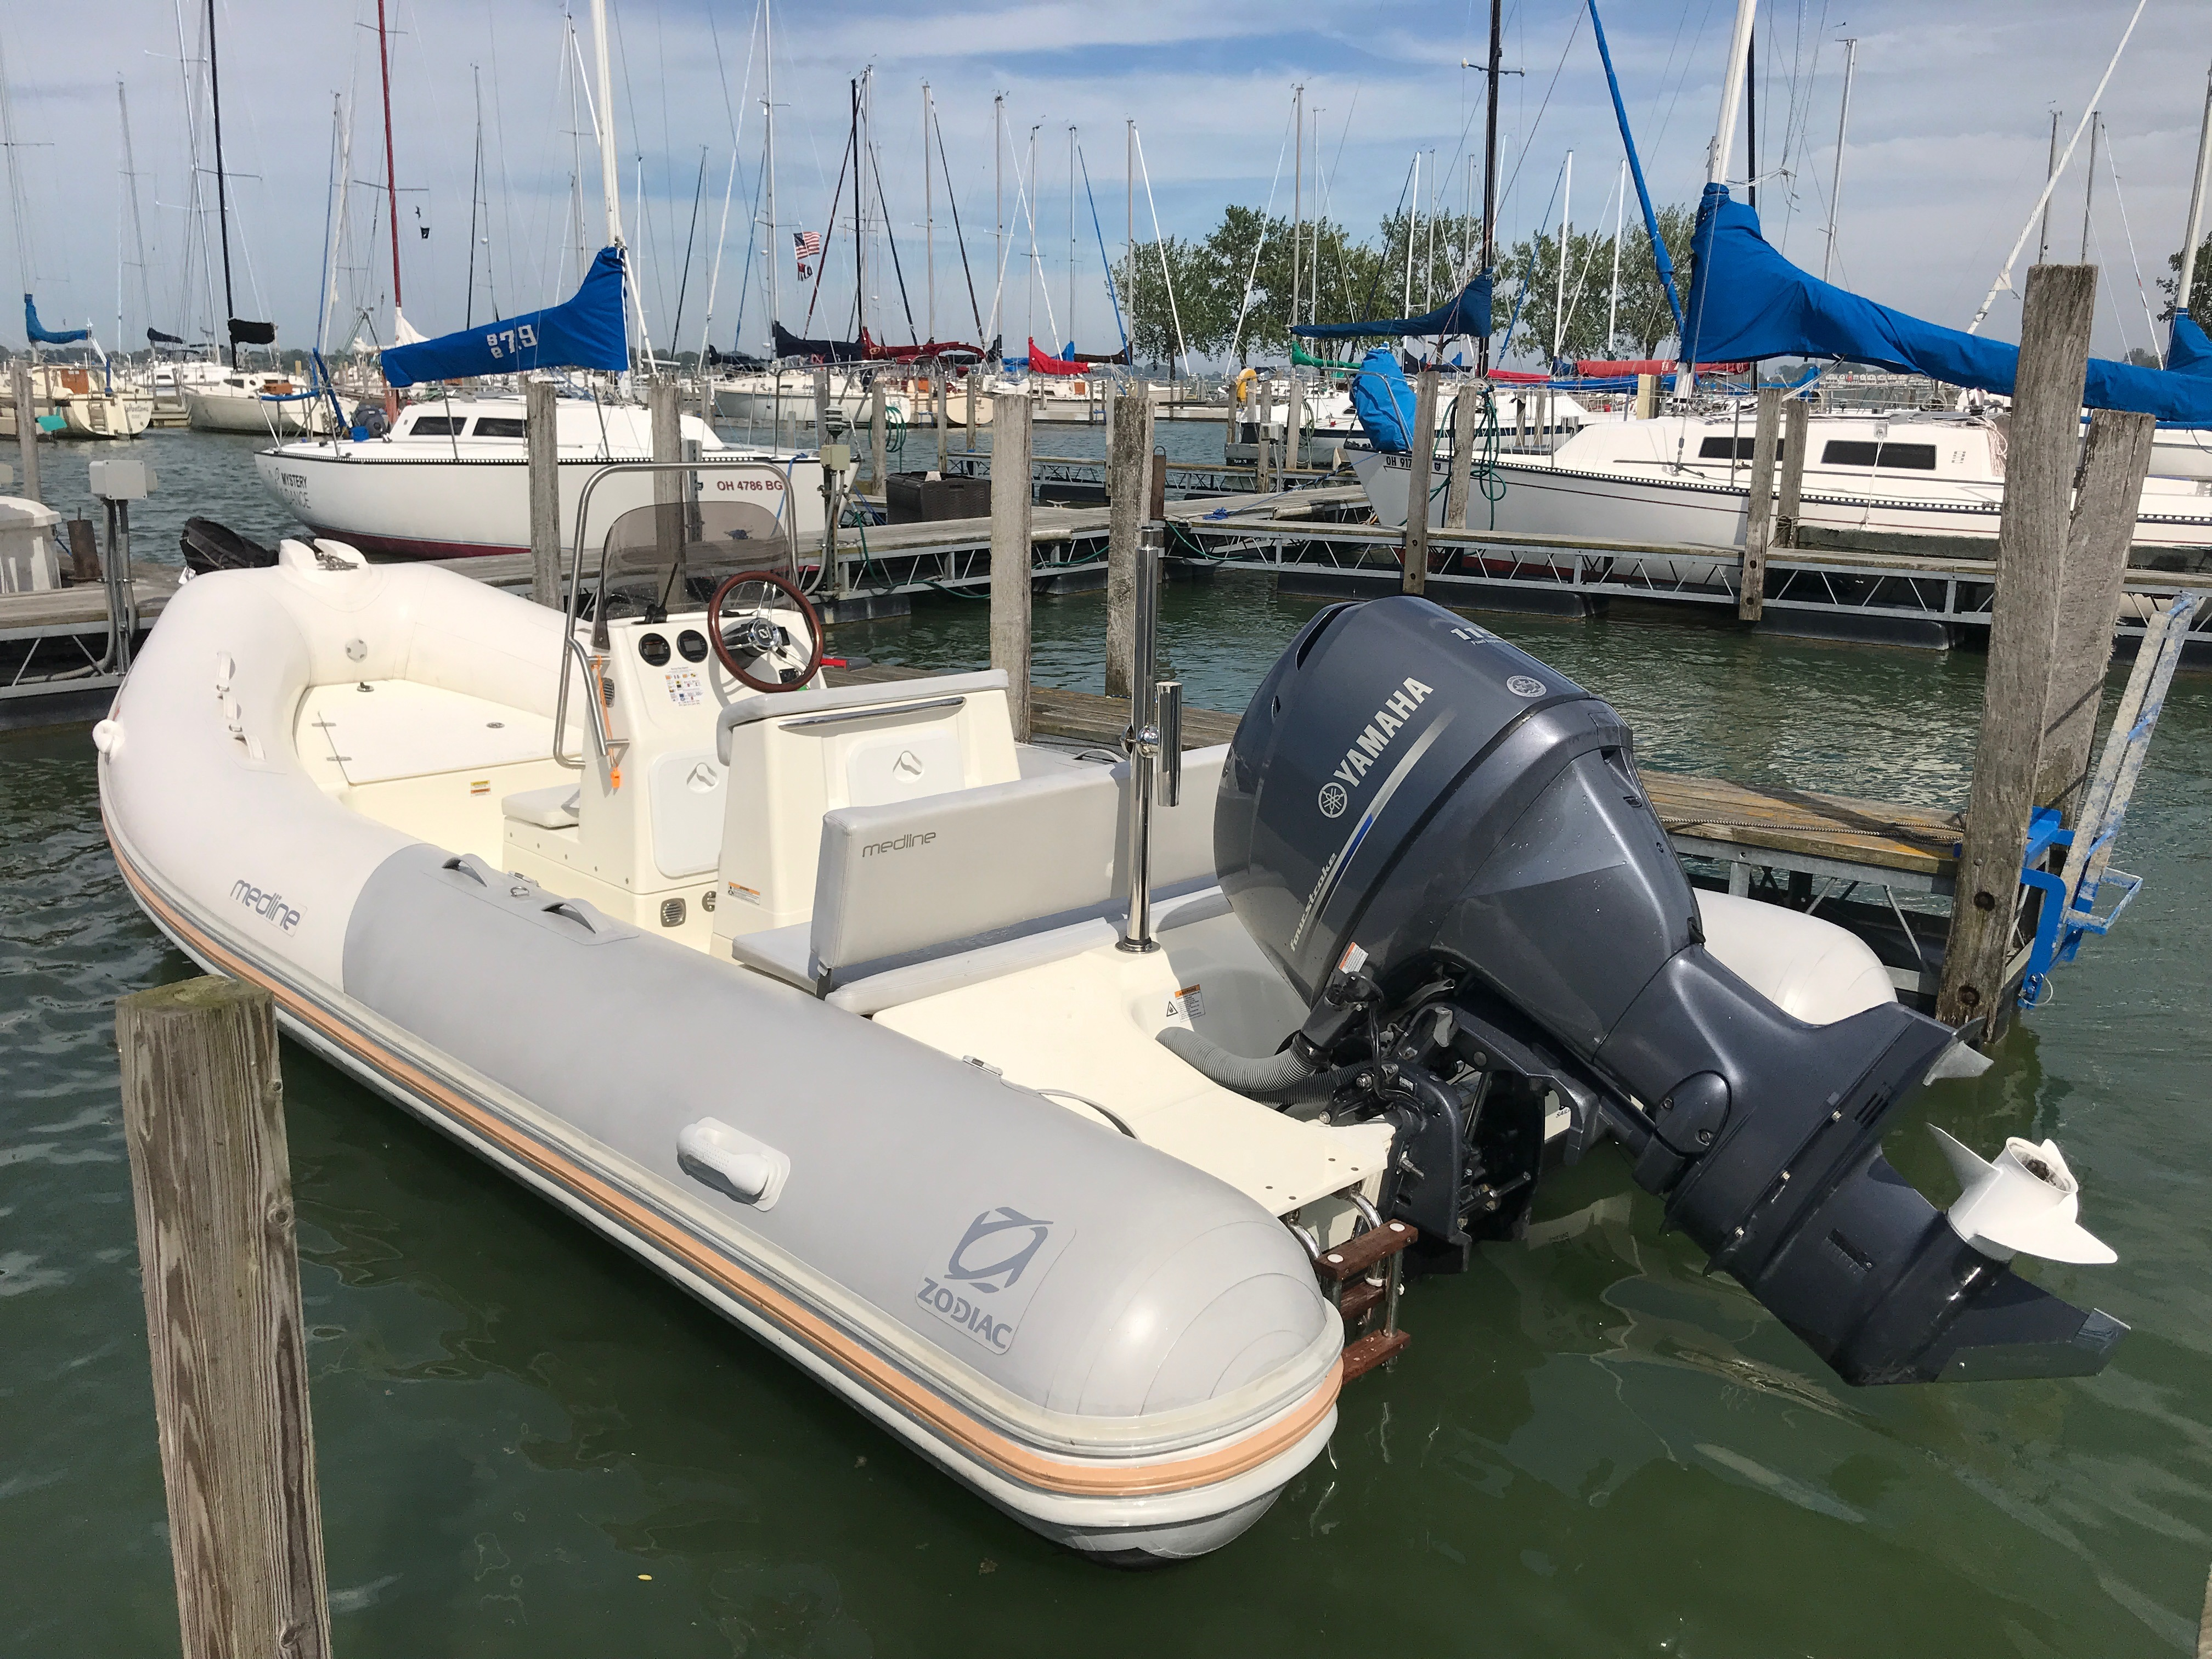 Zodiac boats for sale - Boat Trader